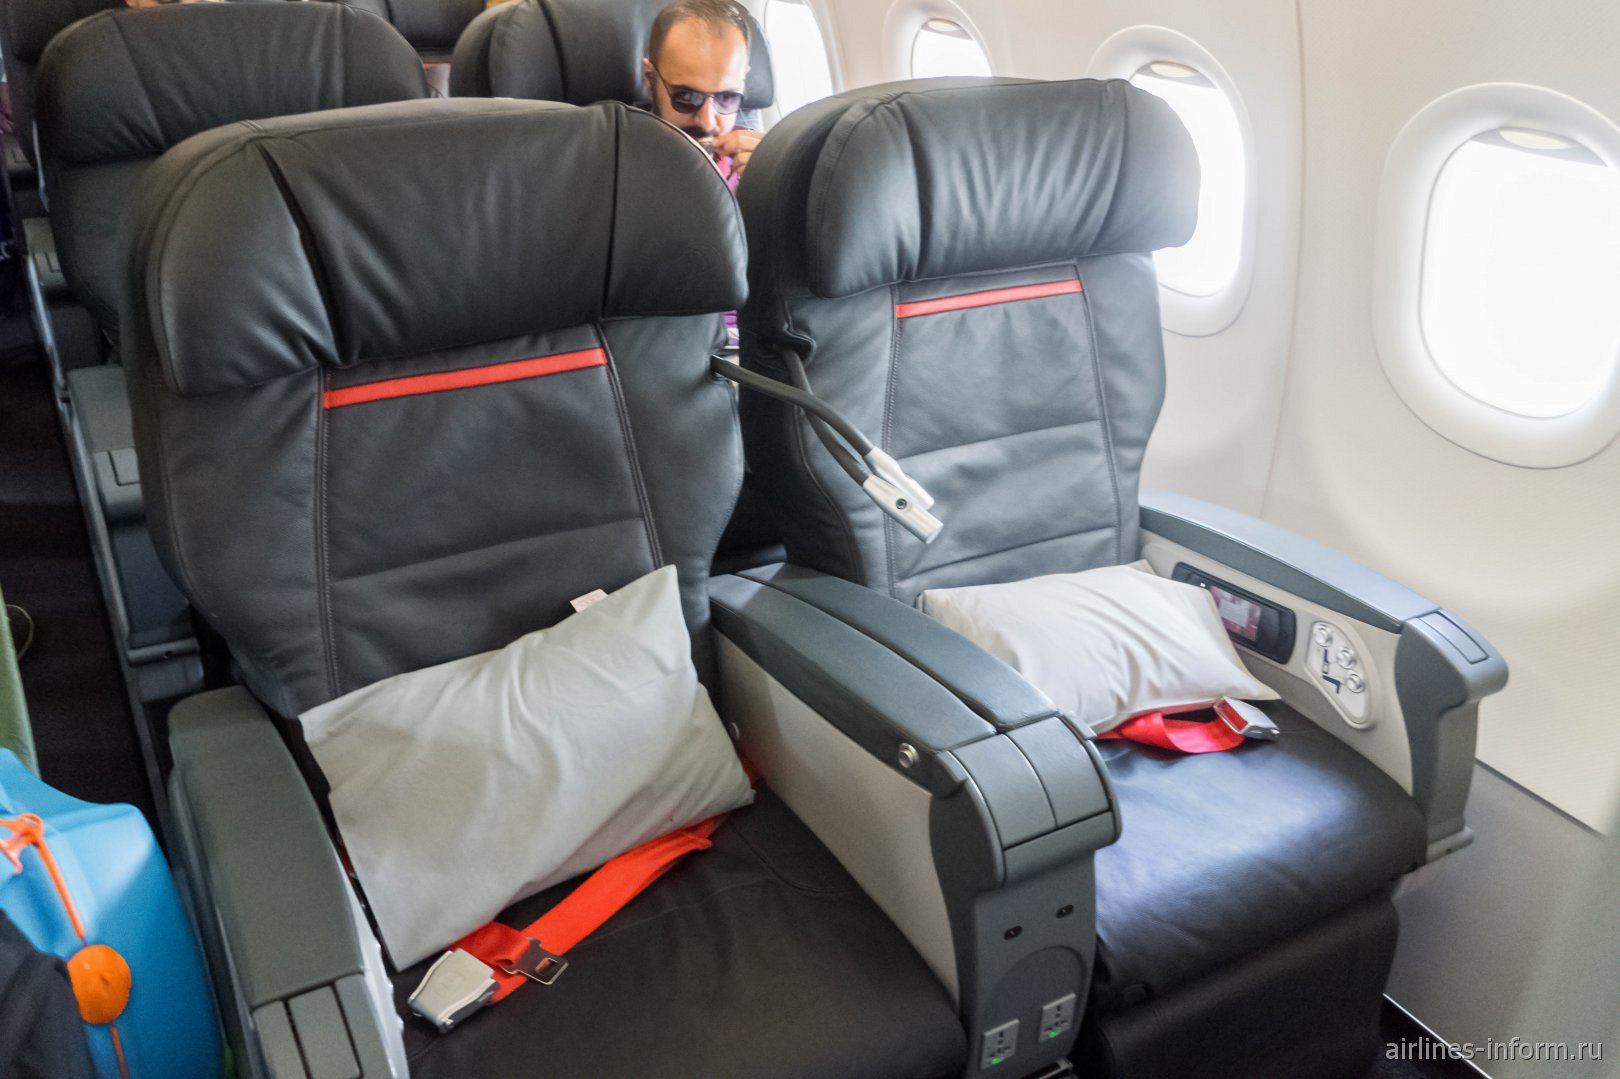 Бизнес-класс в Airbus A321 Турецких авиалиний